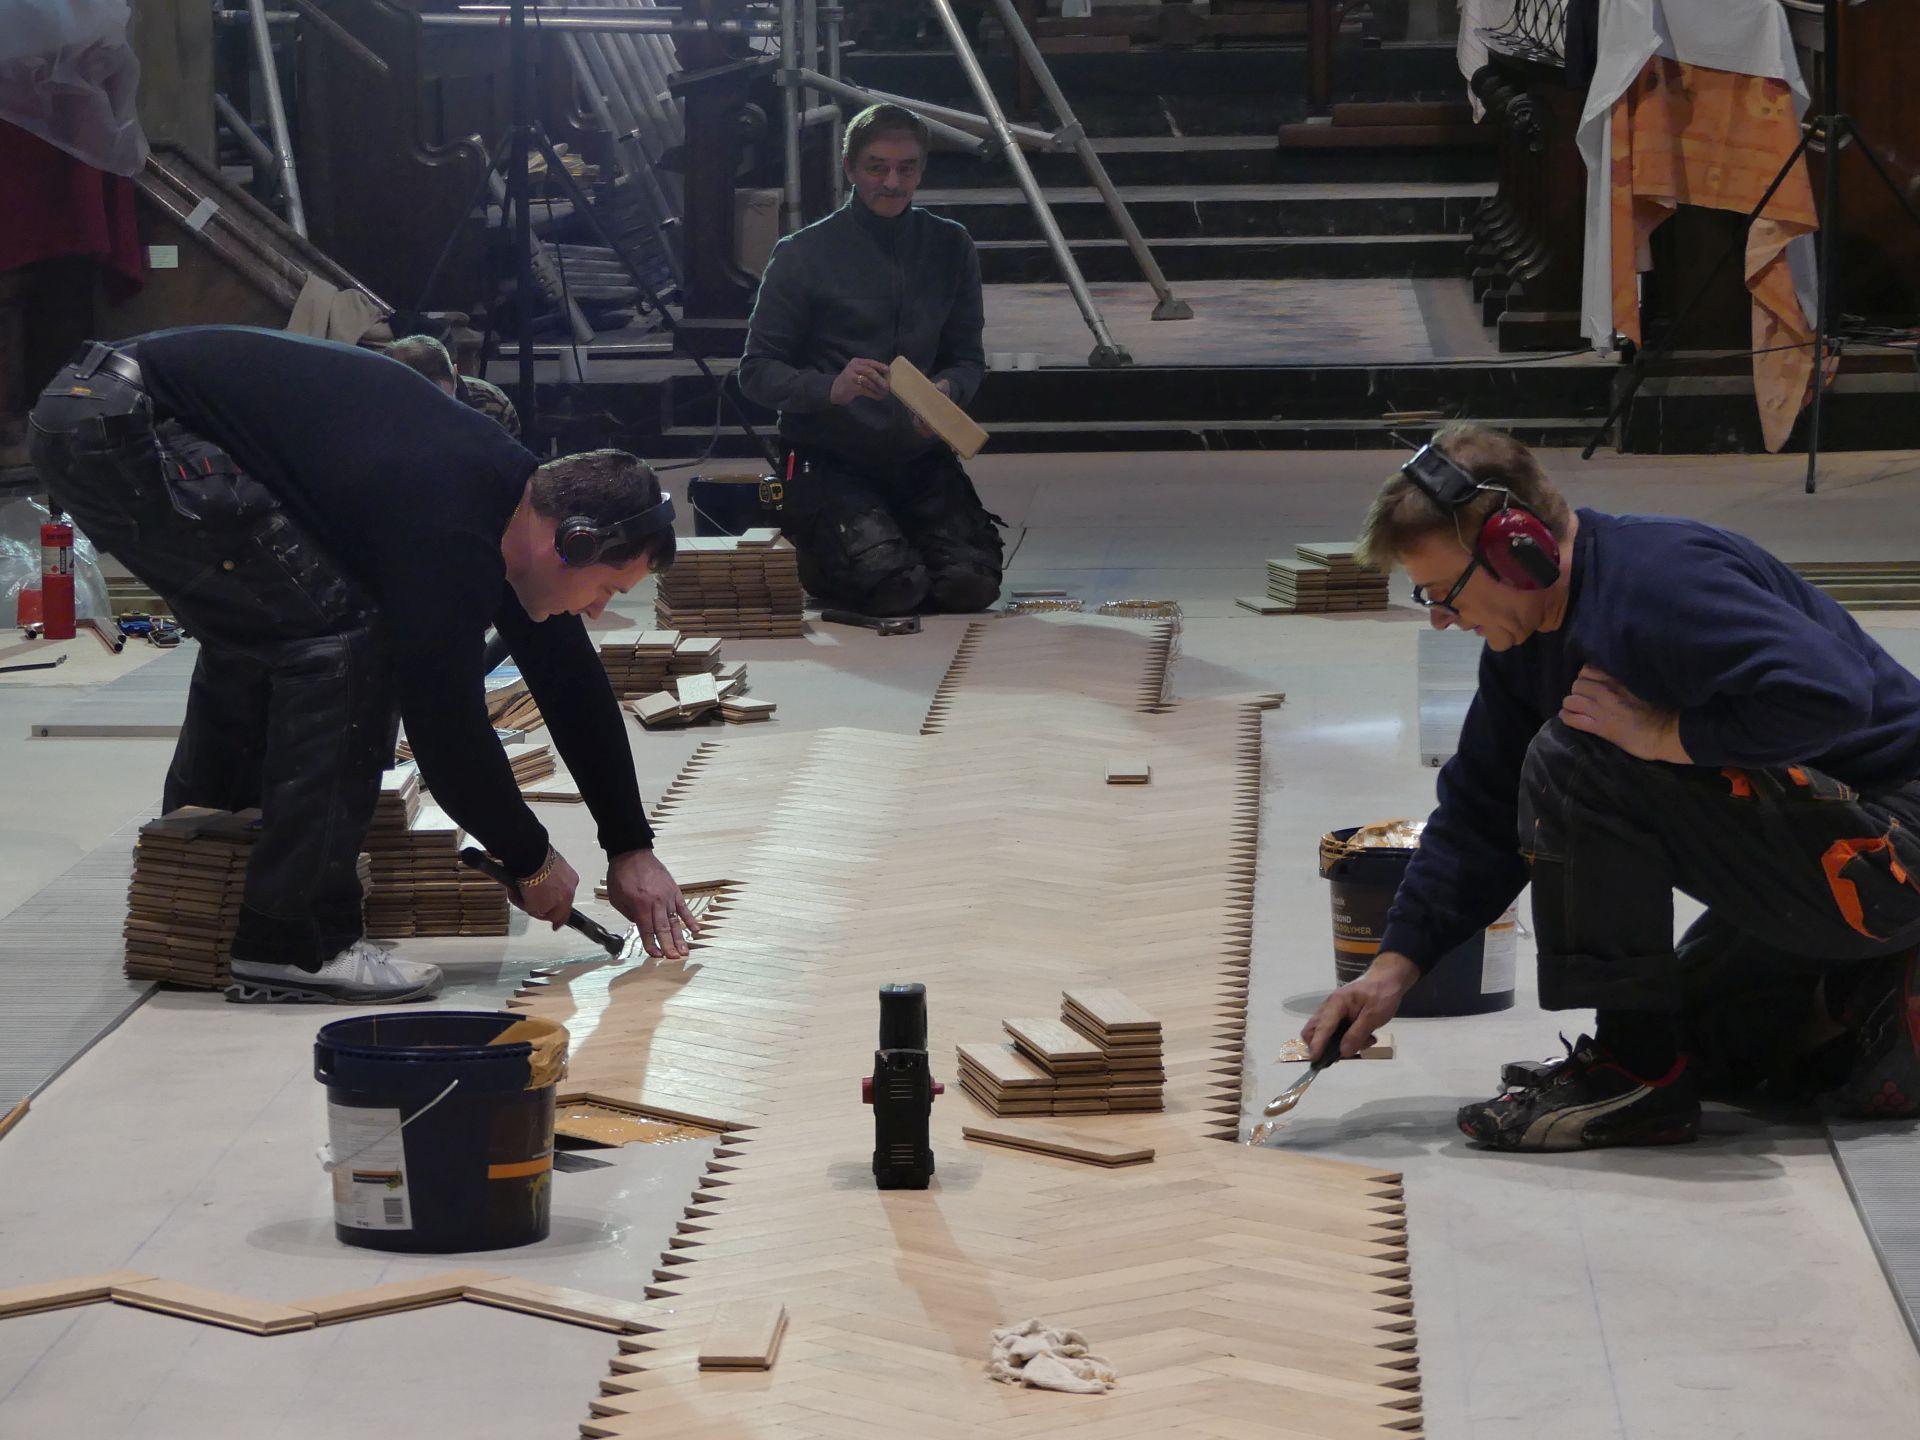 Christ church floor renovation